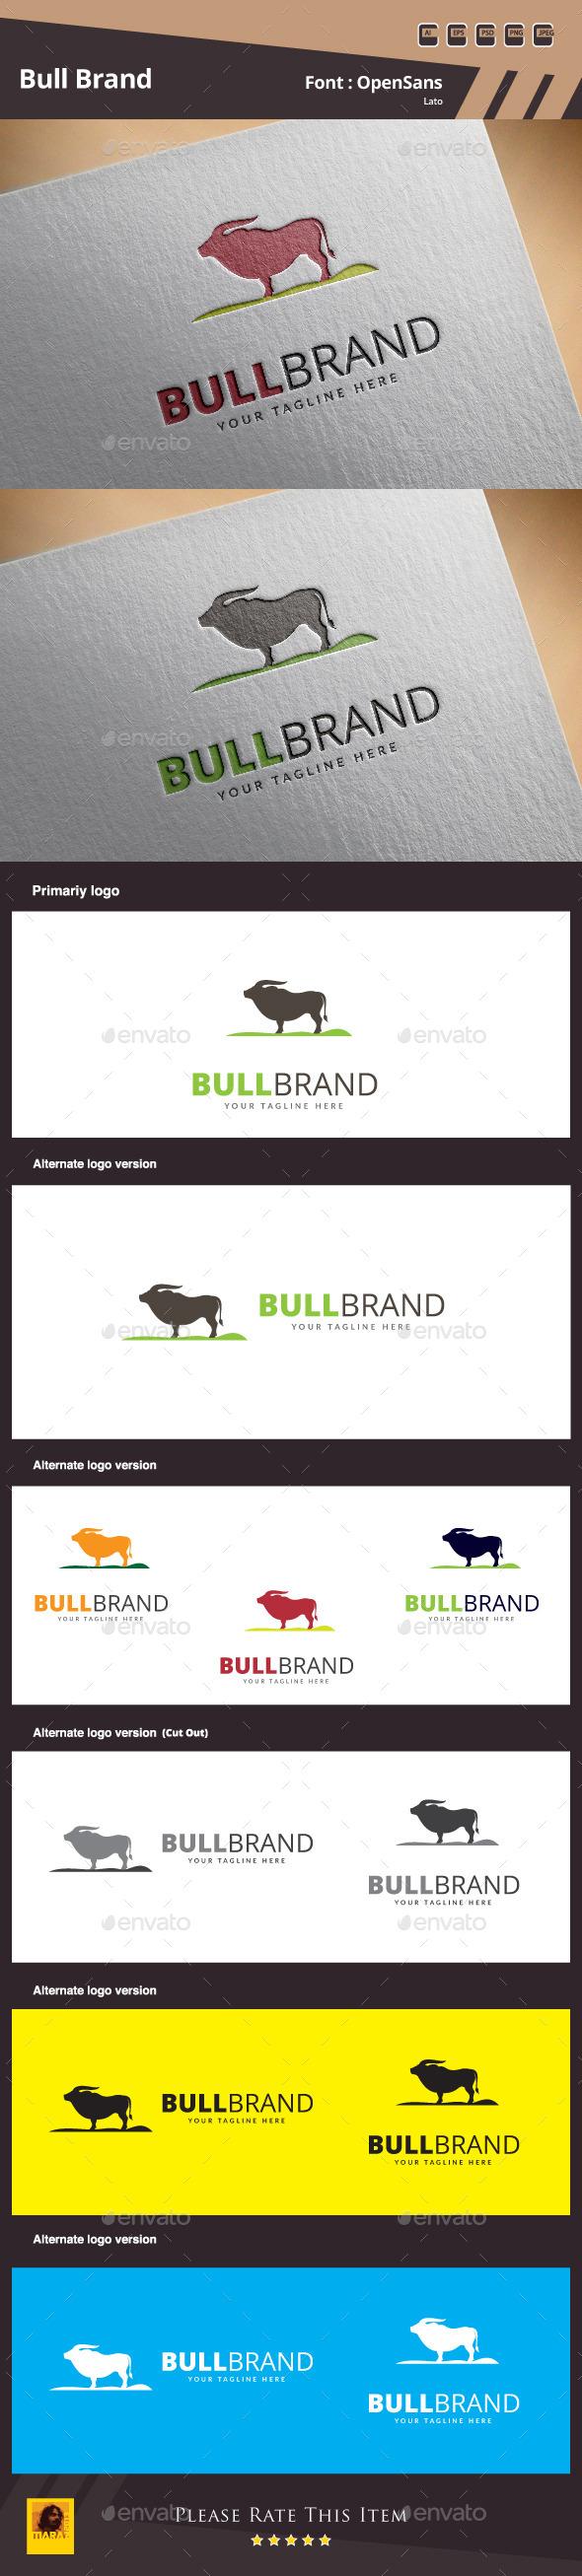 GraphicRiver Bull Brand Logo Template 10608938